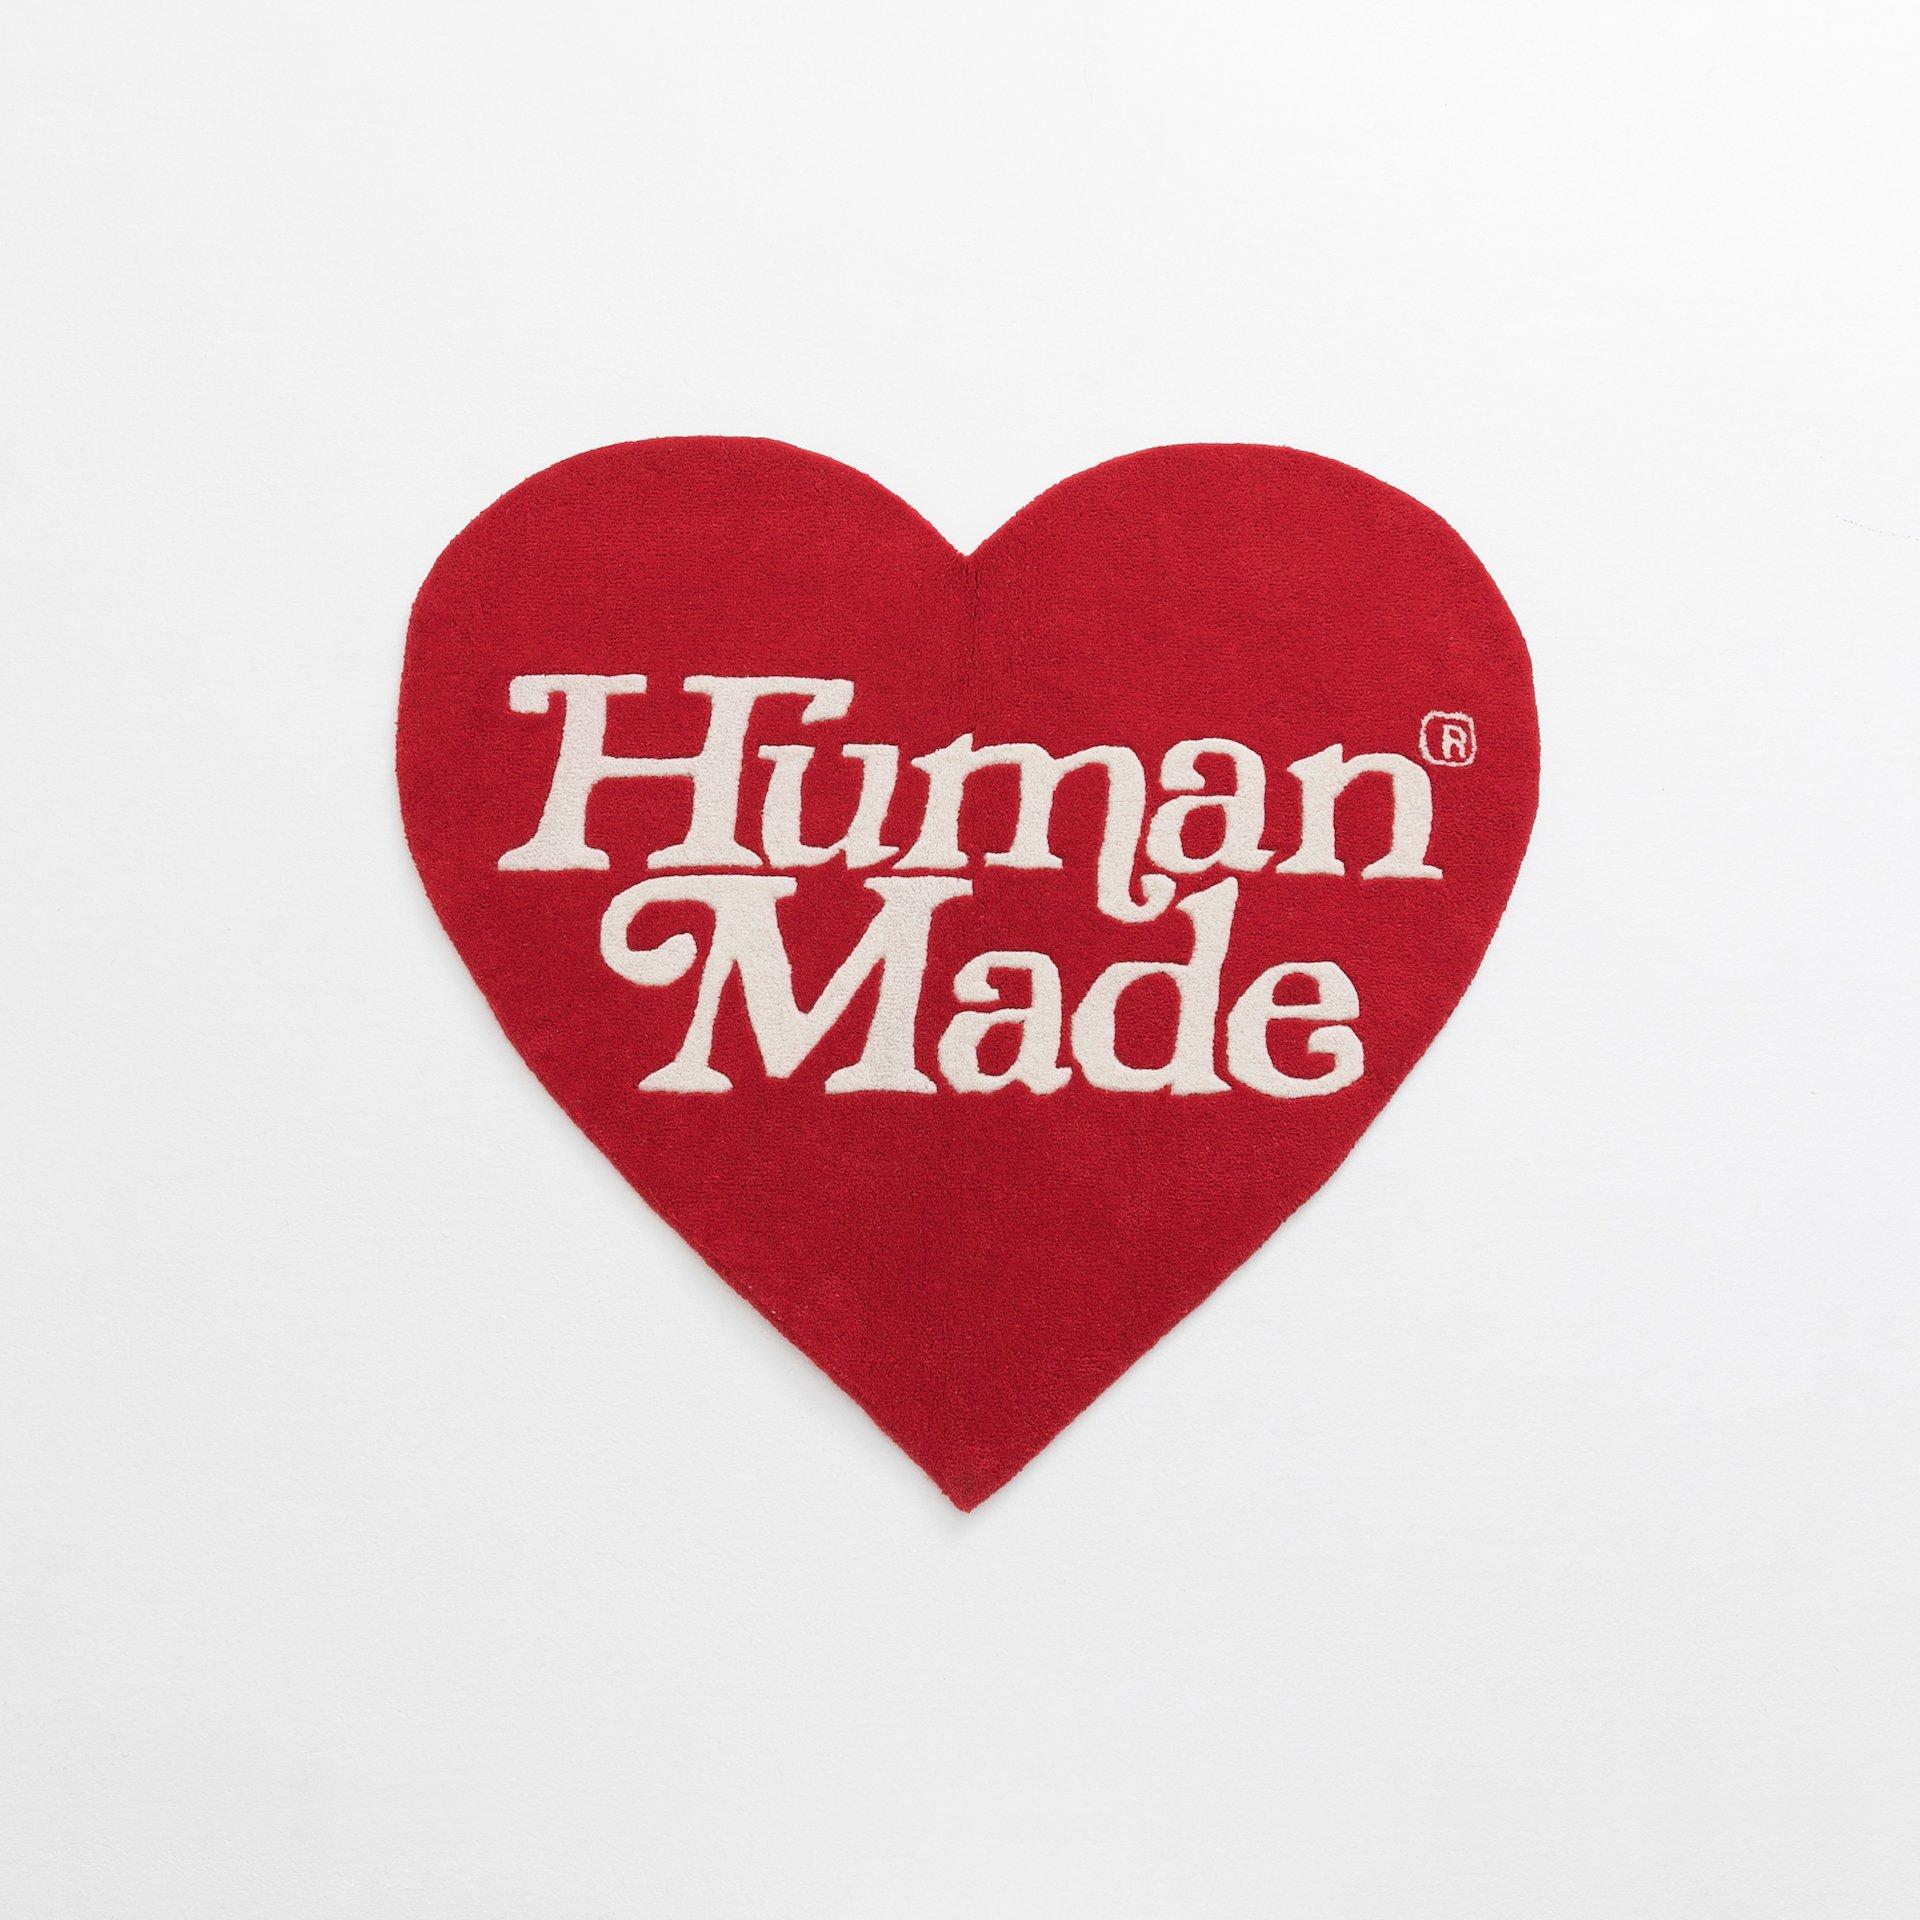 HM17-GD-071_HEART_RUG_RD-A_29ab551e-7bf3-46a4-93b9-0d33a30ce446.jpg